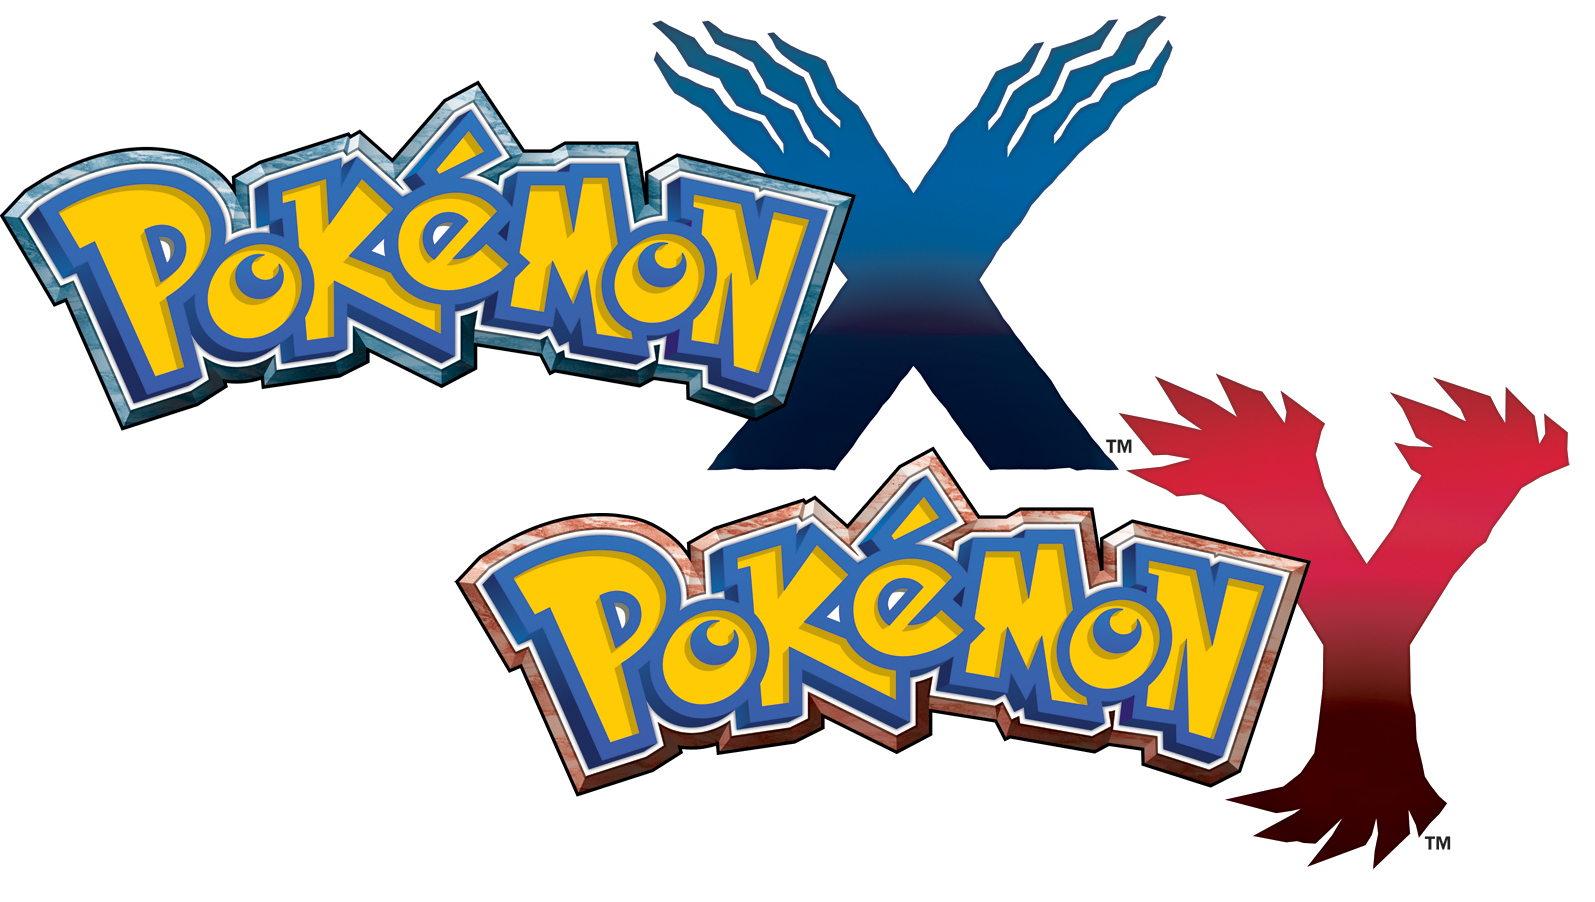 10830753995 2e25c9a0b5 o Pokémon X & Y (3DS)   Official Soundtrack Now Available On iTunes